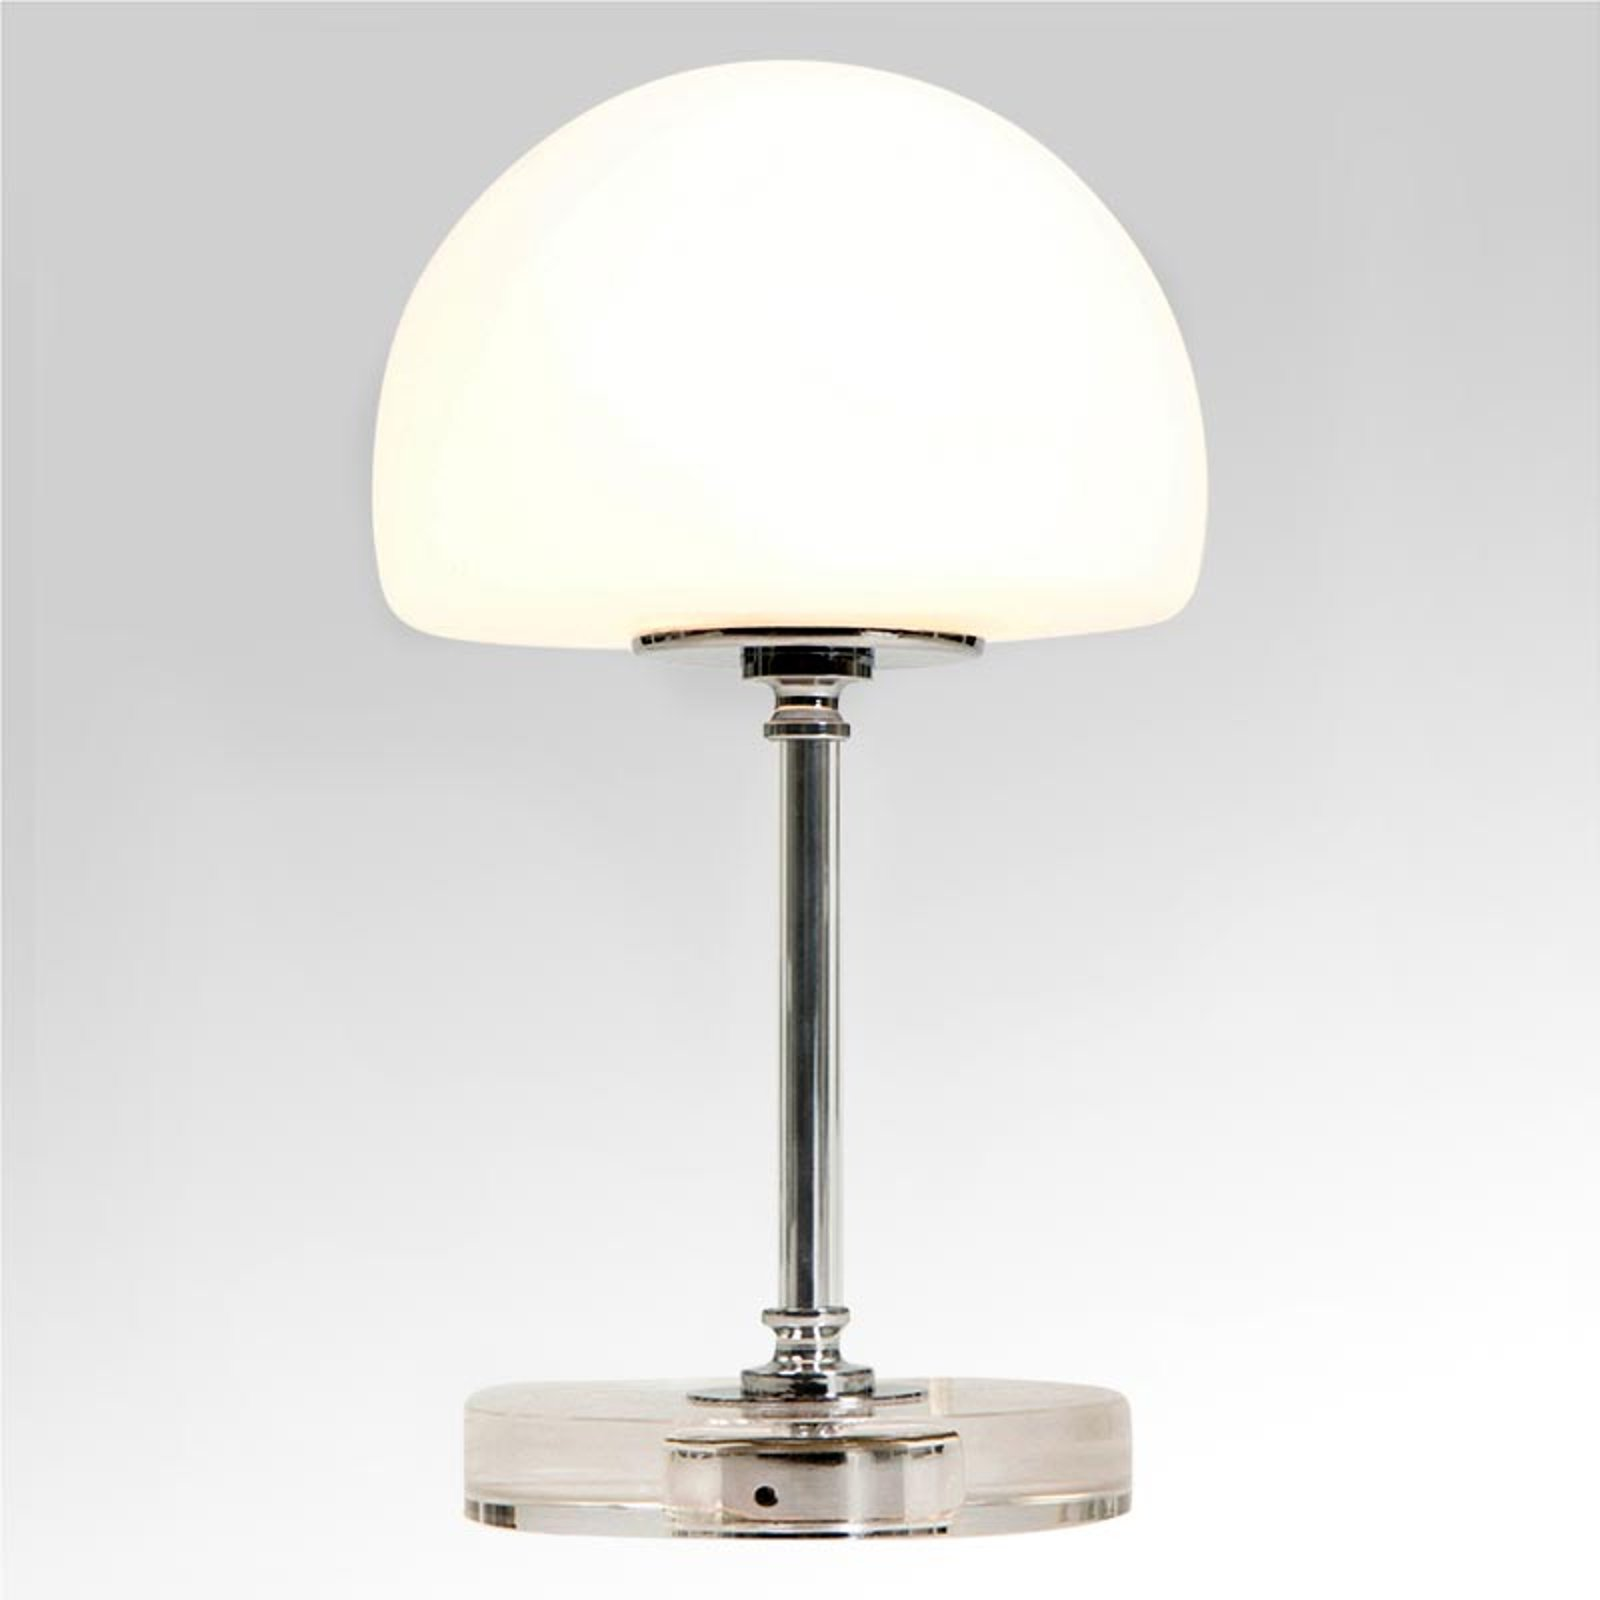 Ancilla - krom LED-bordlampe med dimmer